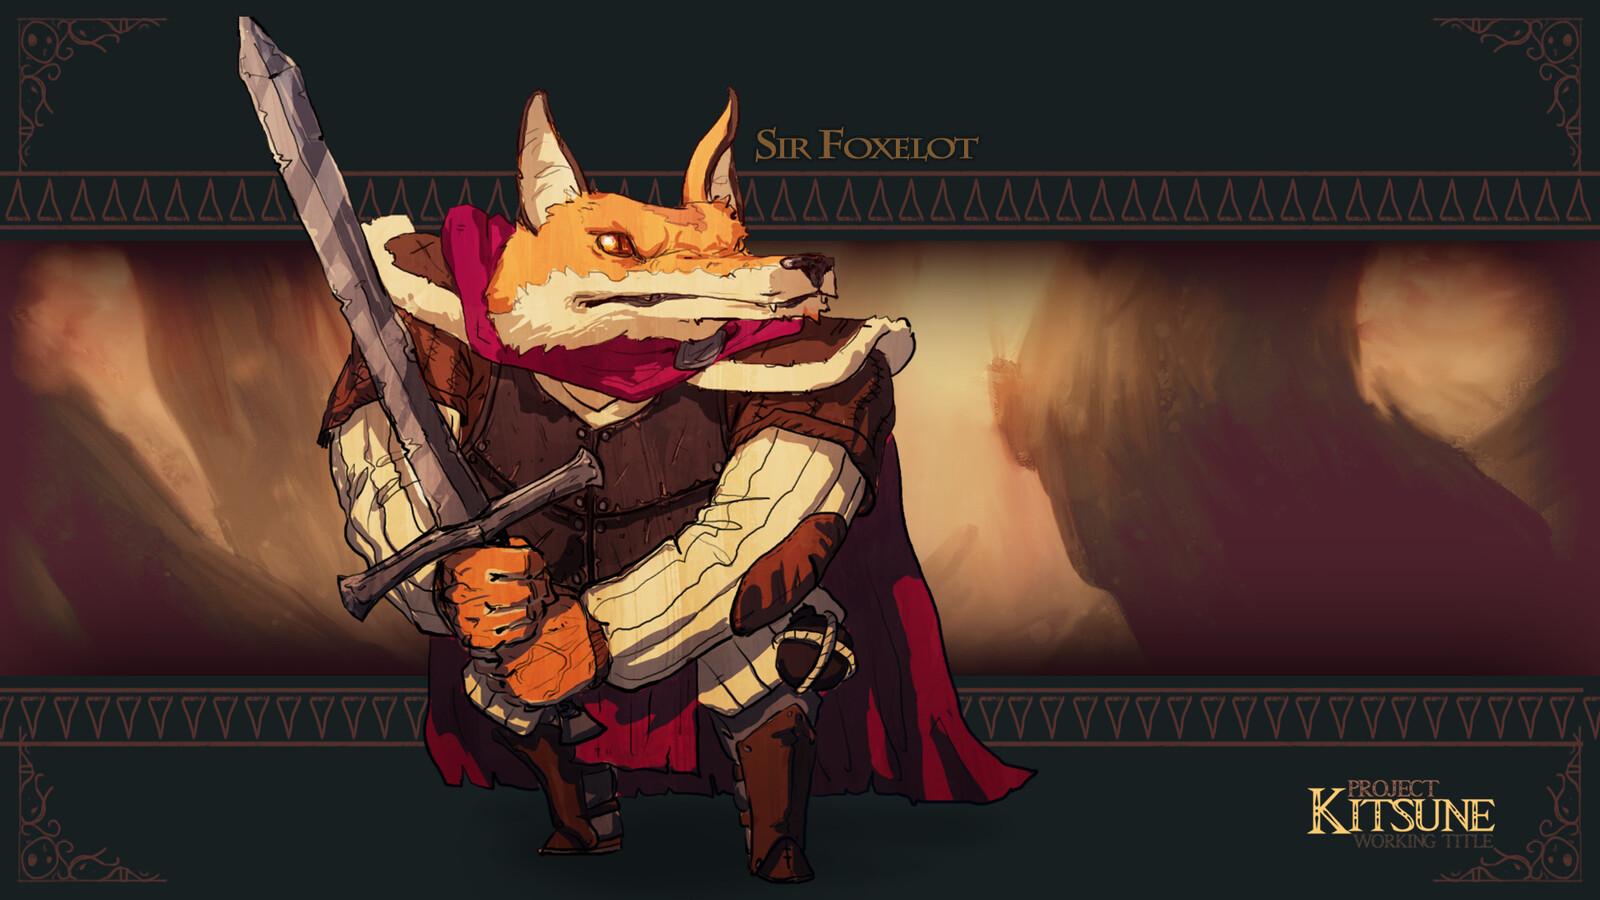 Sir Foxelot